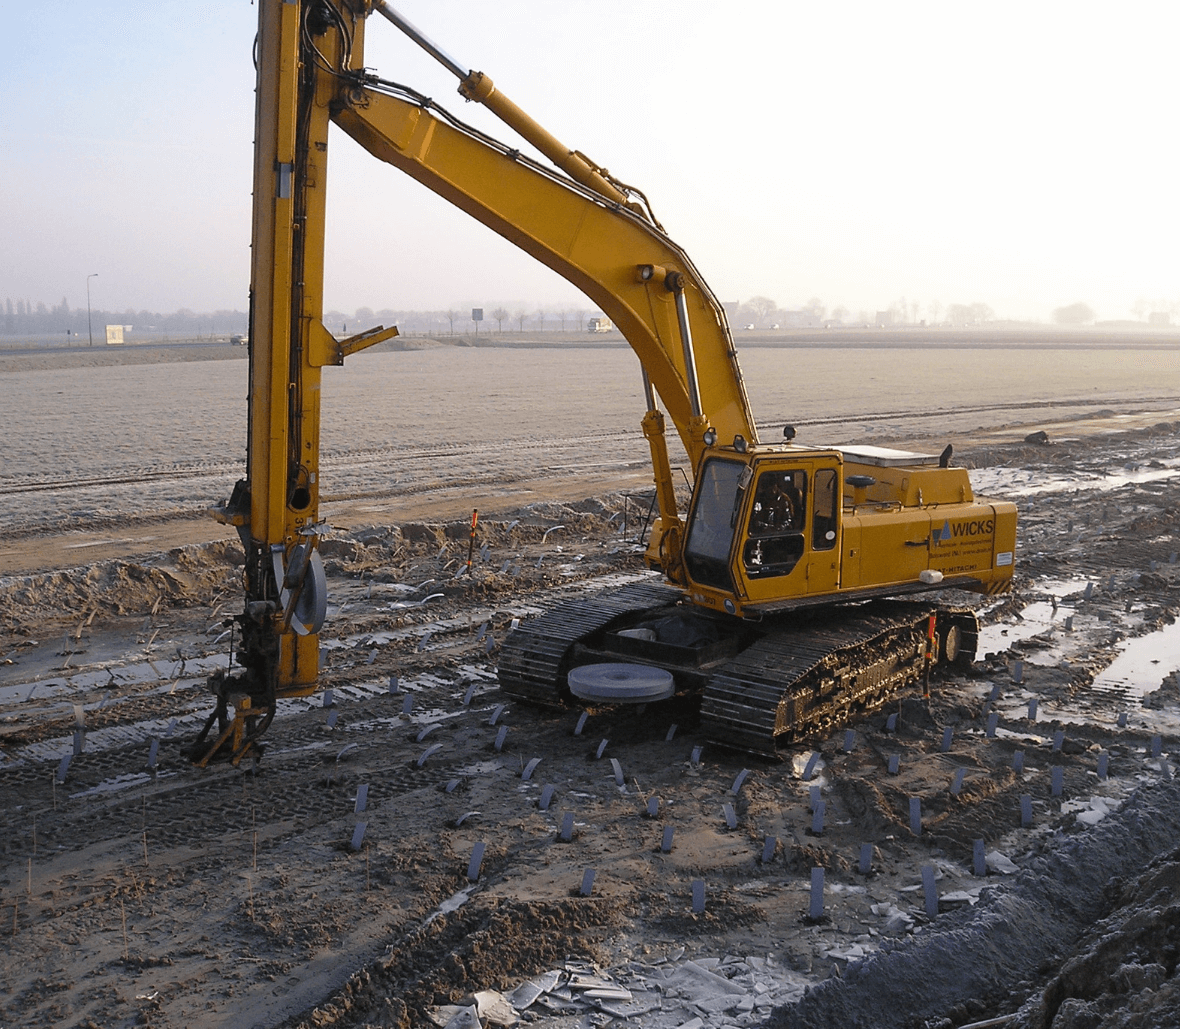 ColbondDrain_PVD for soil consolidation_copyrigts Low & Bonar_Enka Solutions (2)